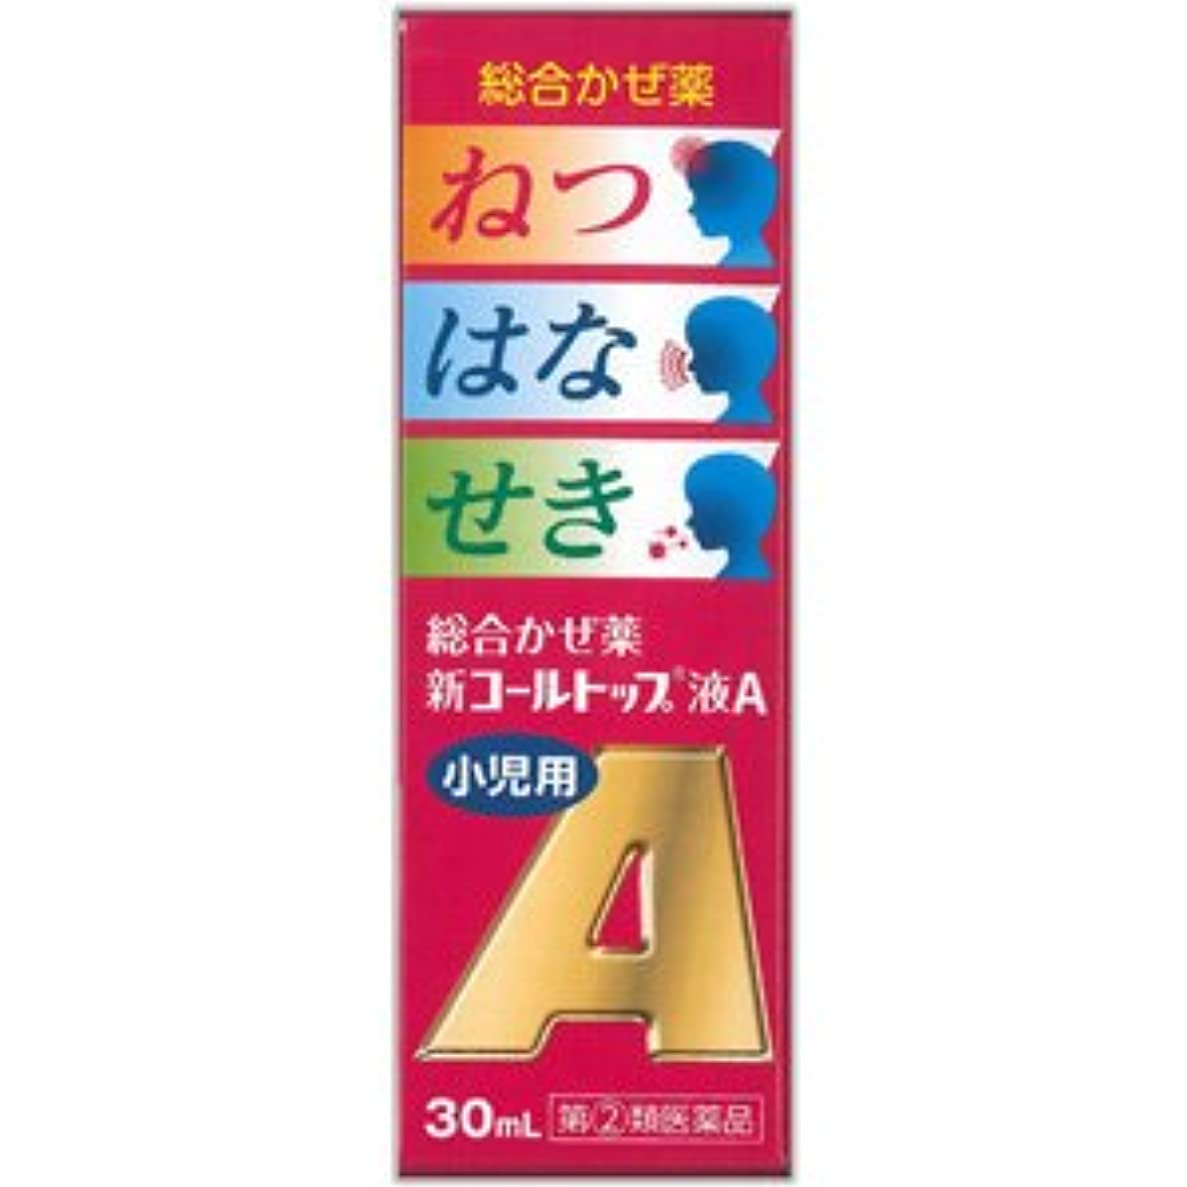 飼料お肉対応【指定第2類医薬品】小児用新コールトップ液A 30mL ×5